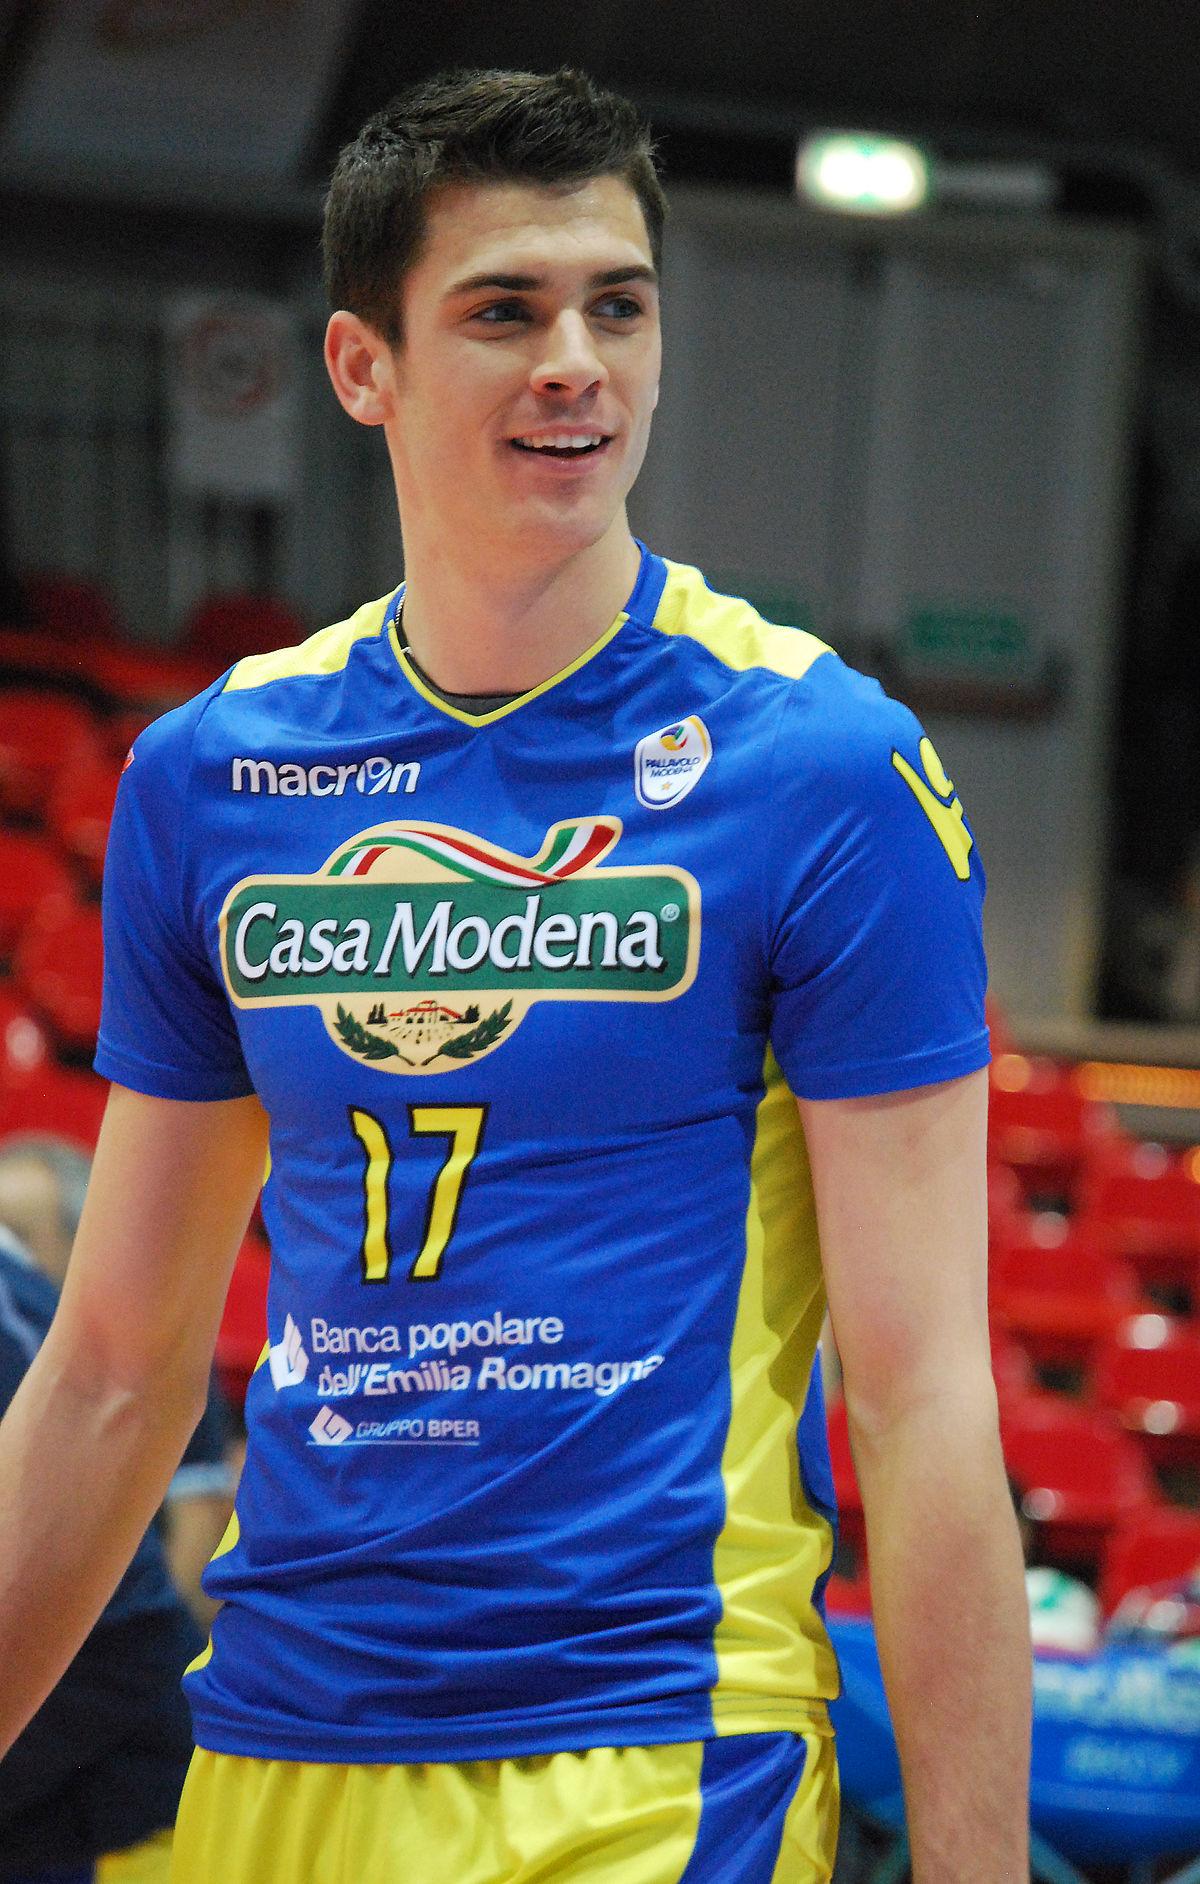 Matthew anderson wikipedia wolna encyklopedia for Casa modena volley